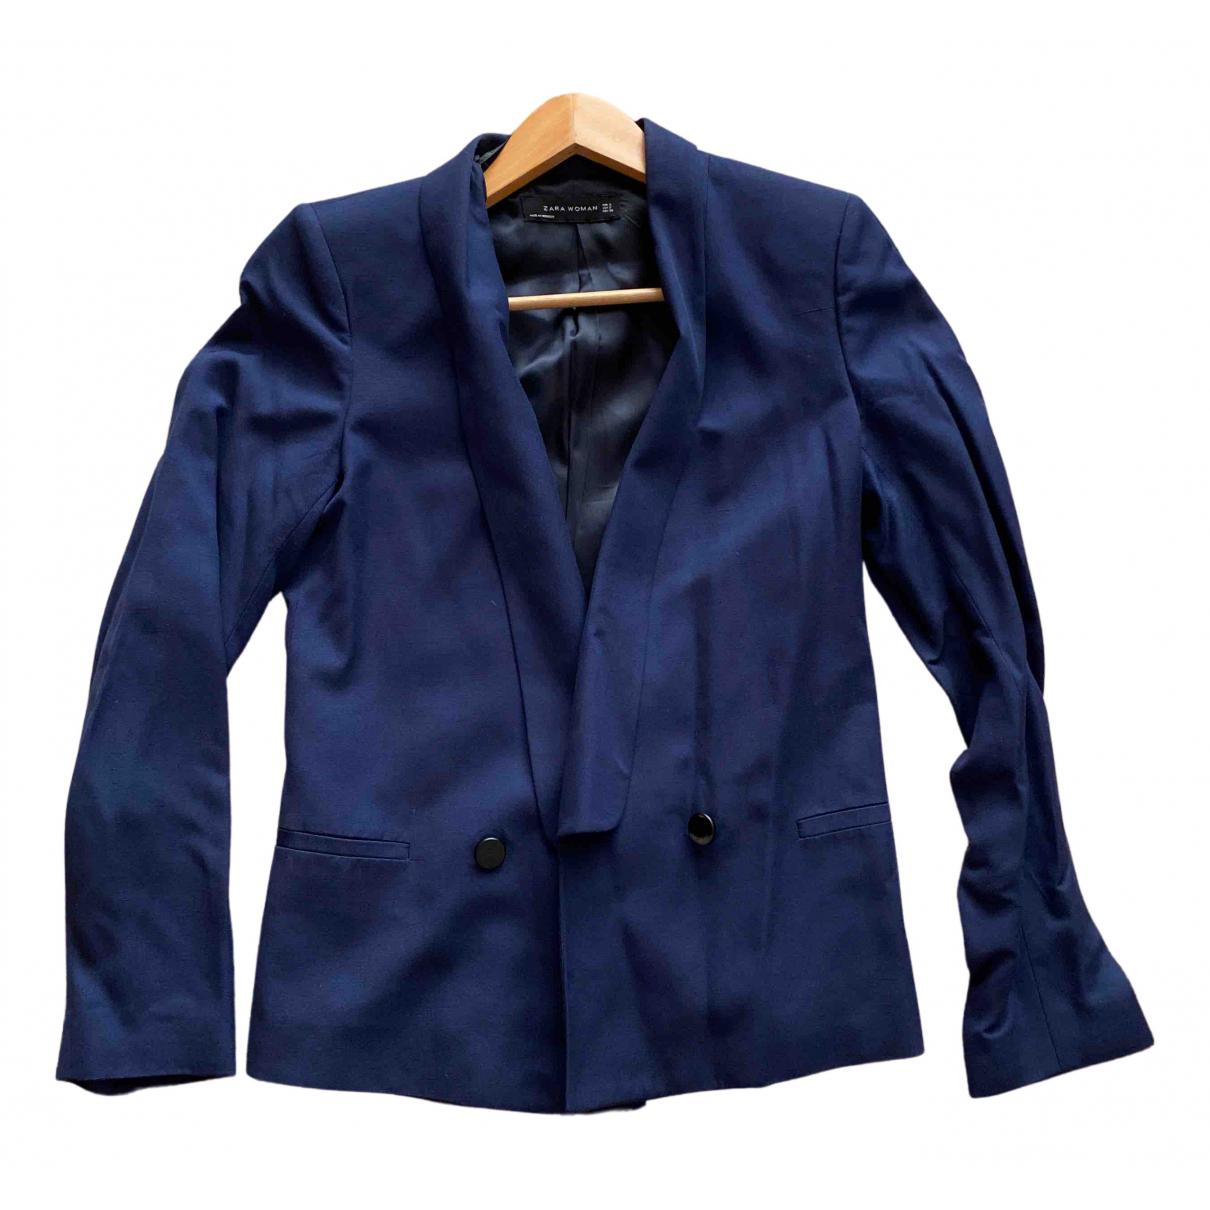 Zara \N Jacke in  Blau Viskose